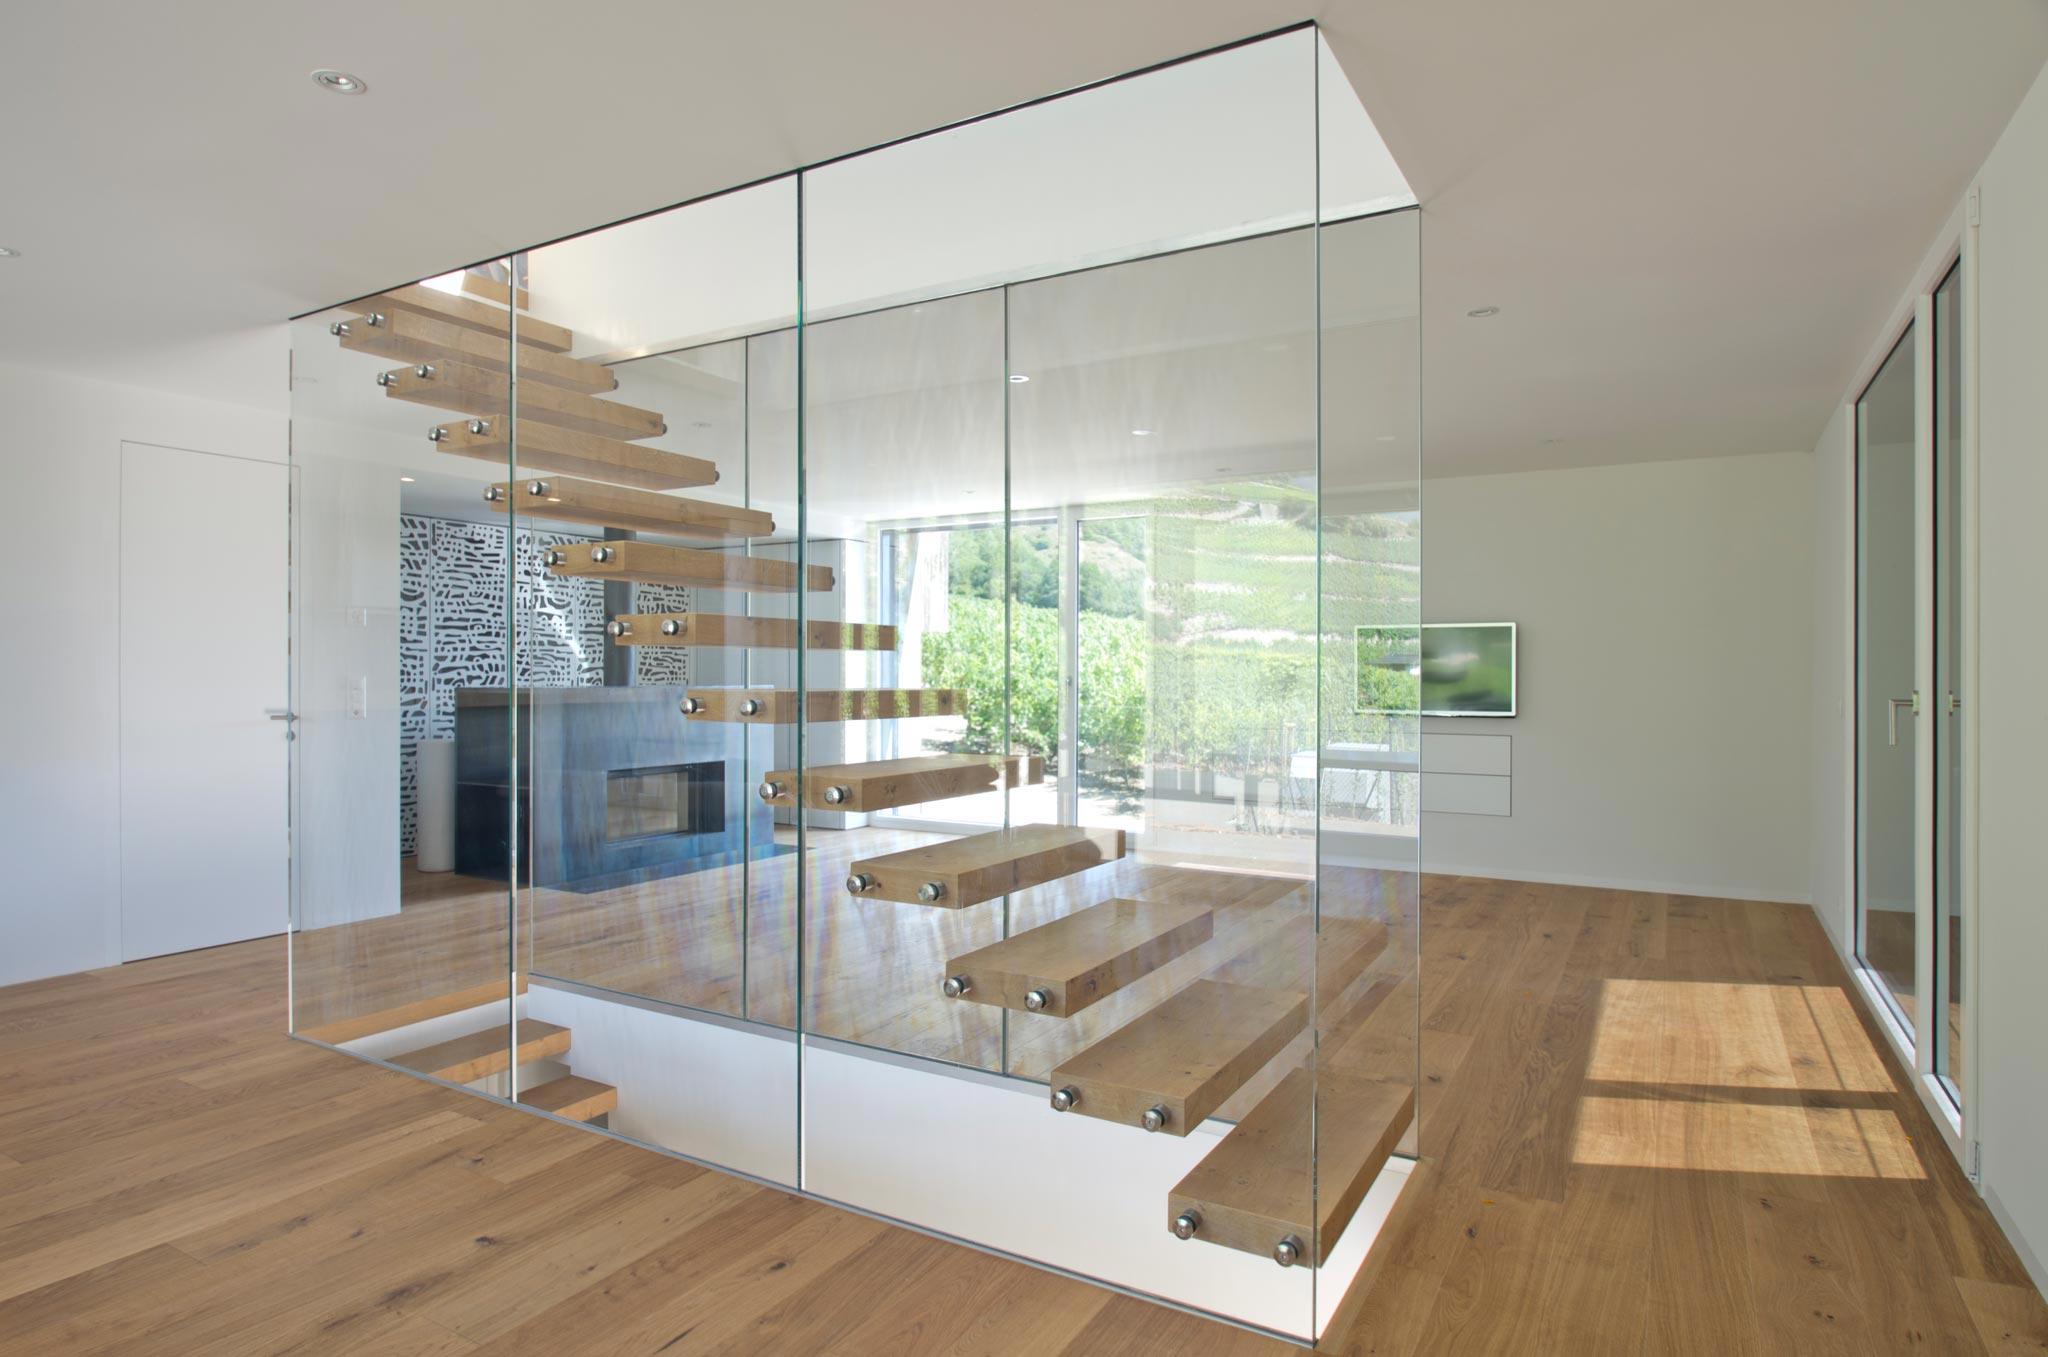 ES Amg escalier hor 20 05 007 - Montée en transparence